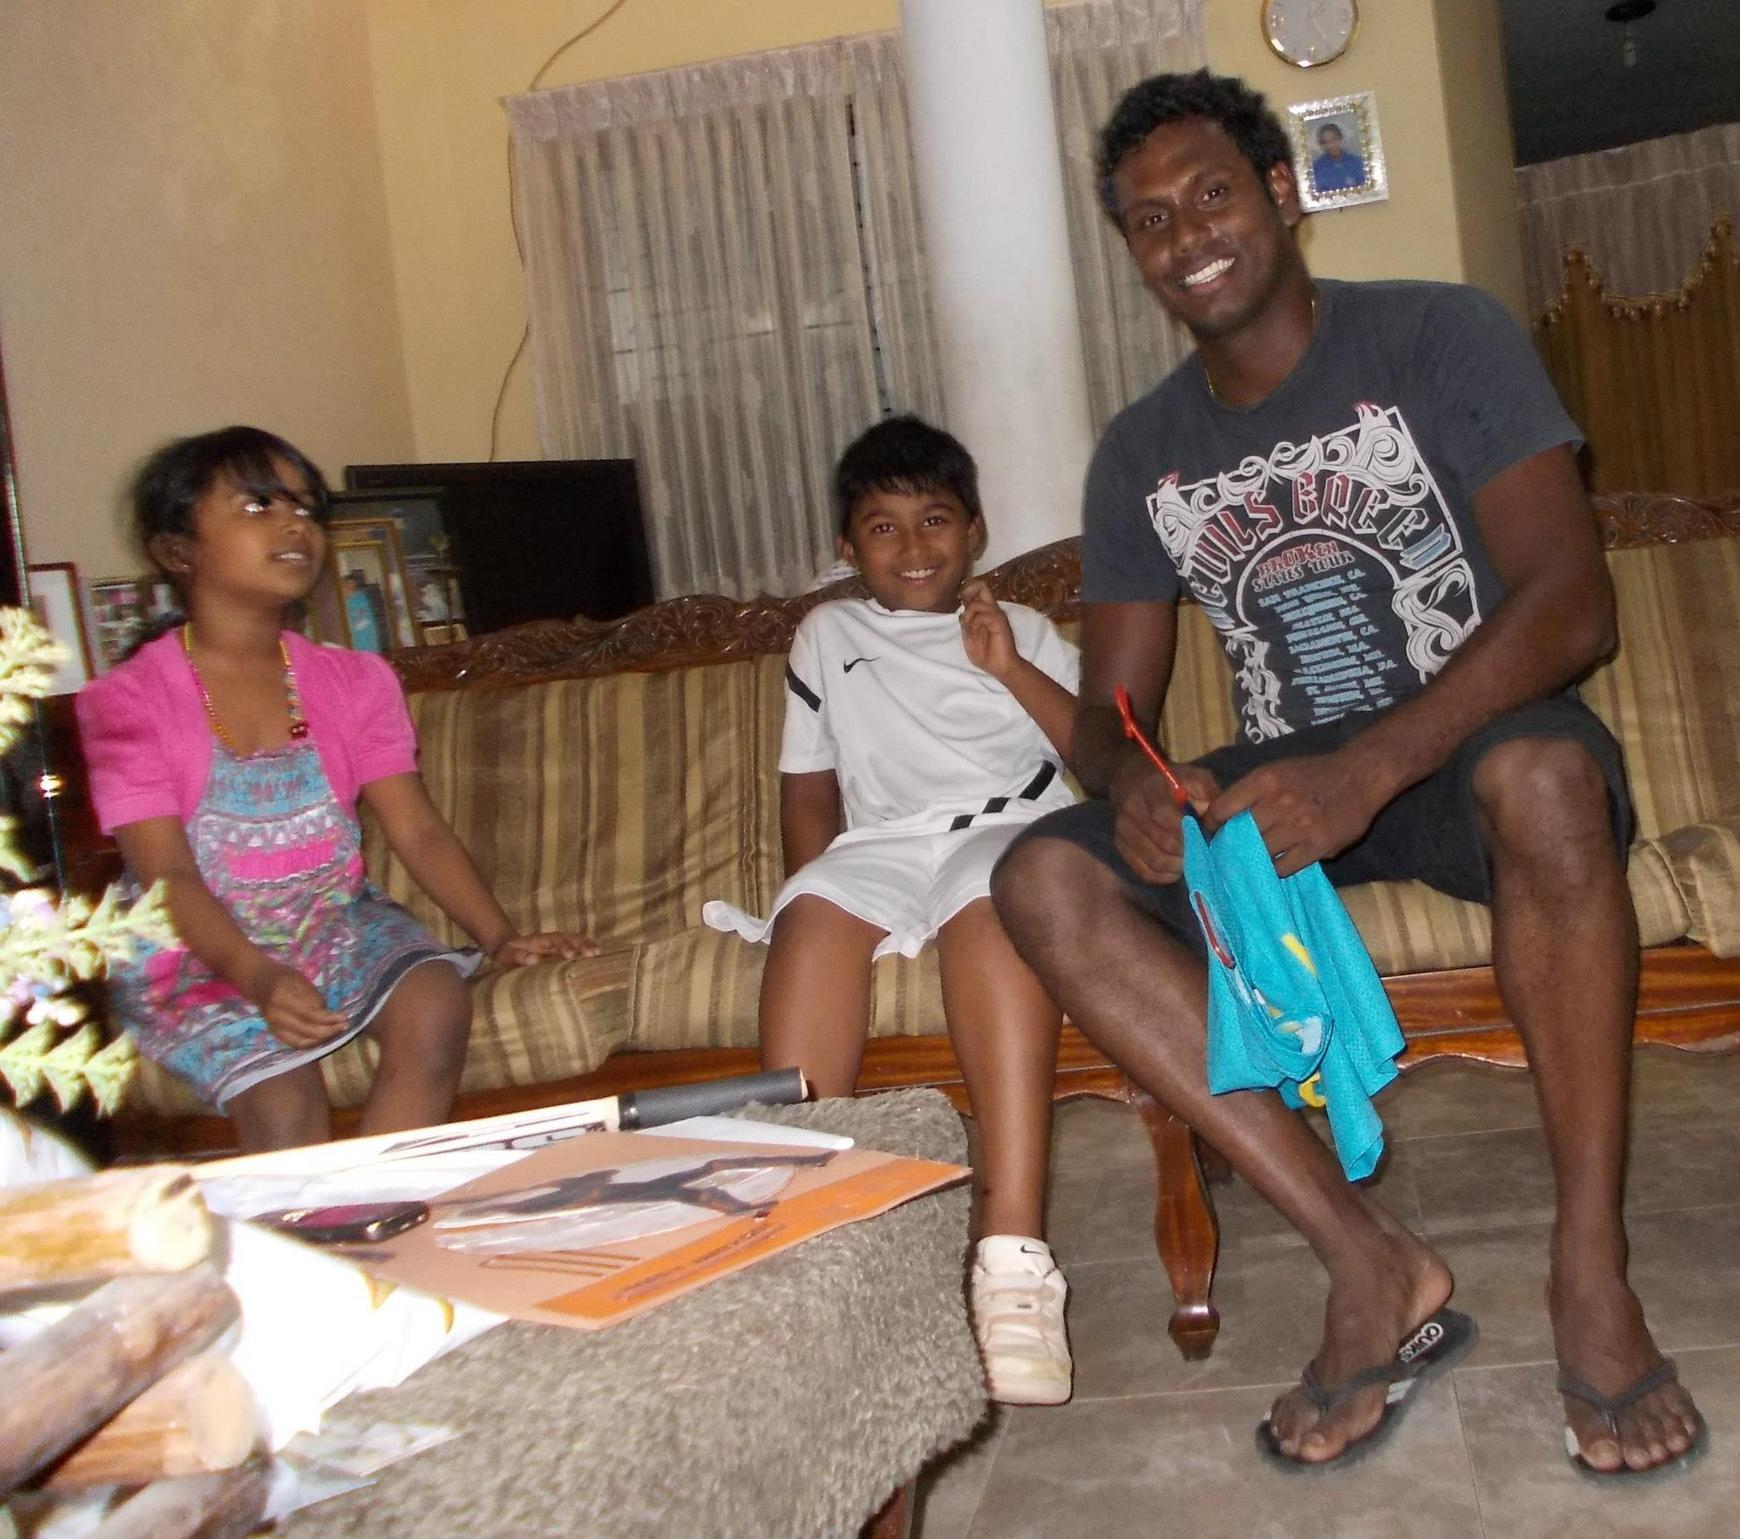 Photos: Angelo Mathews Surpises A Young Fan On